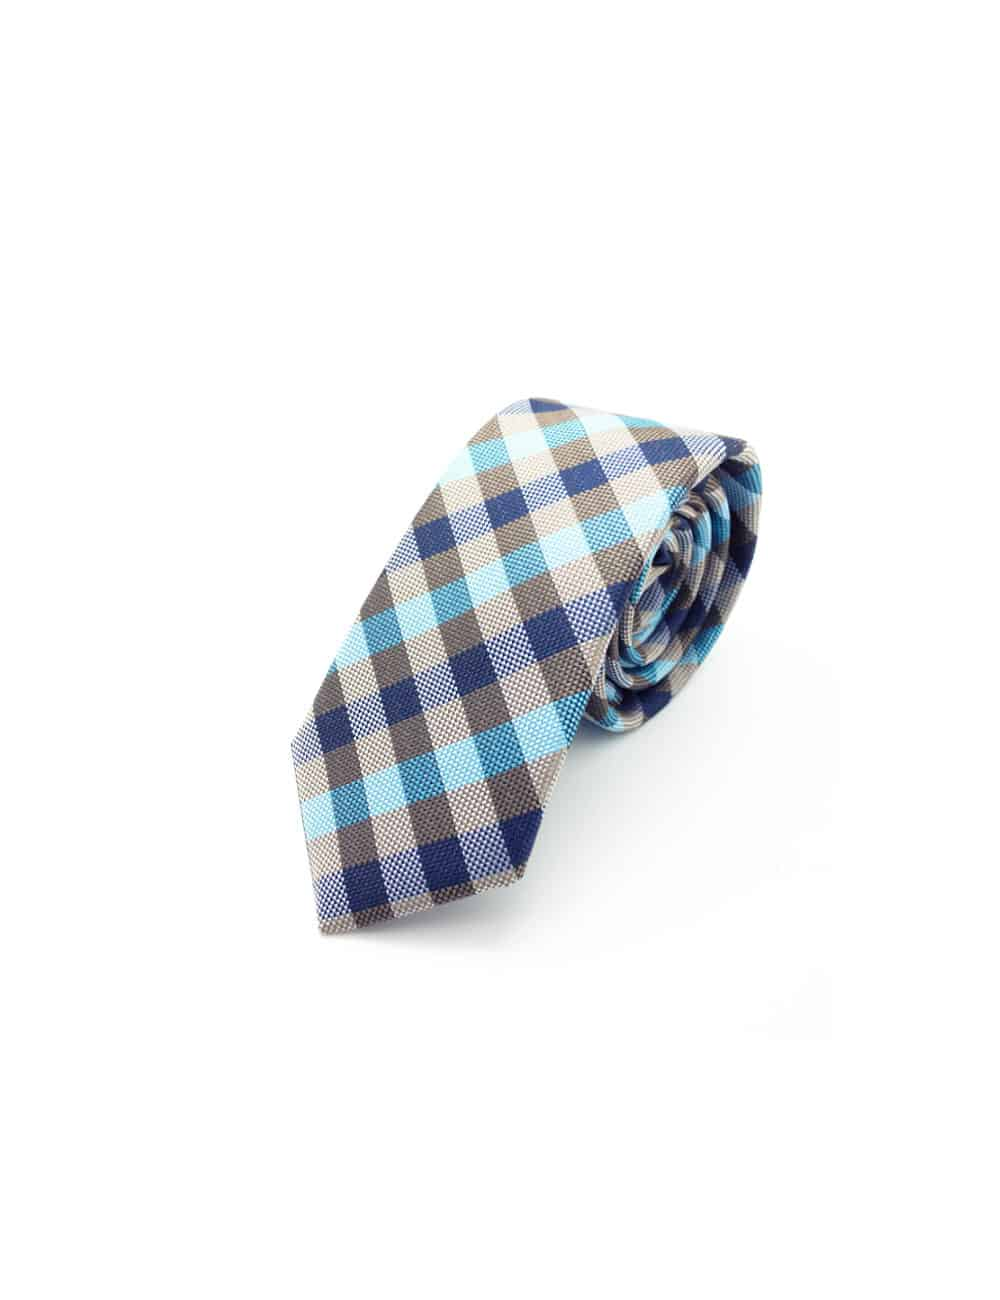 Navy/ Brown/ Blue Checks Spill Resist Woven Necktie NT52.9